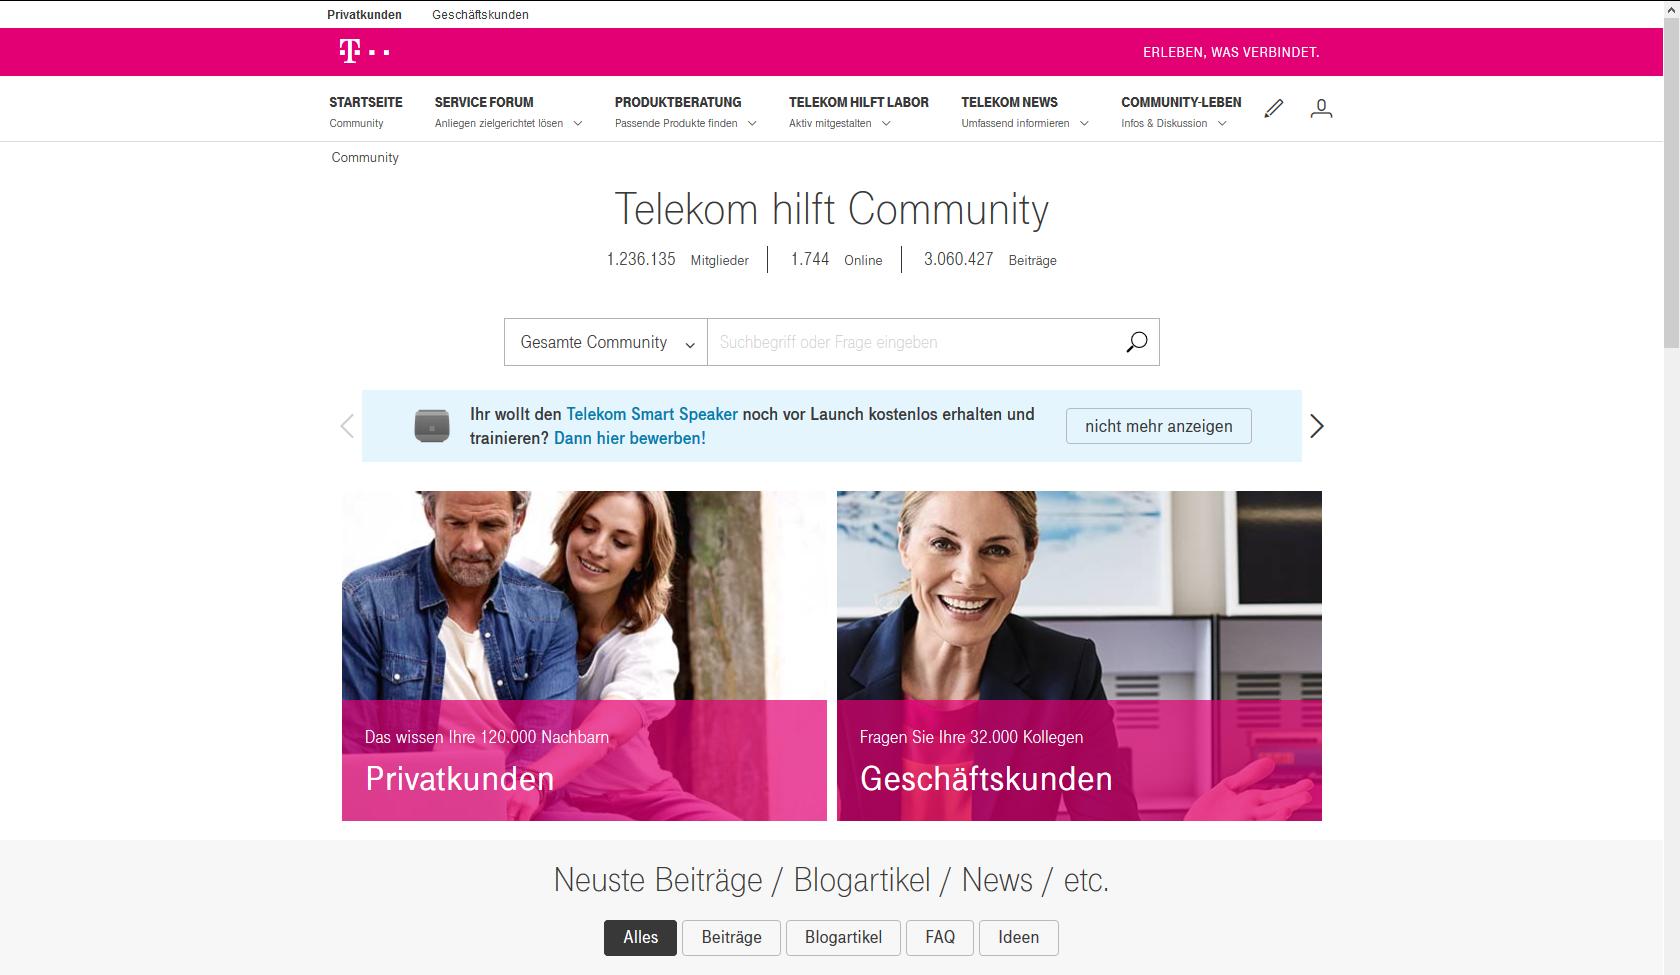 CSS - telekom_hilft